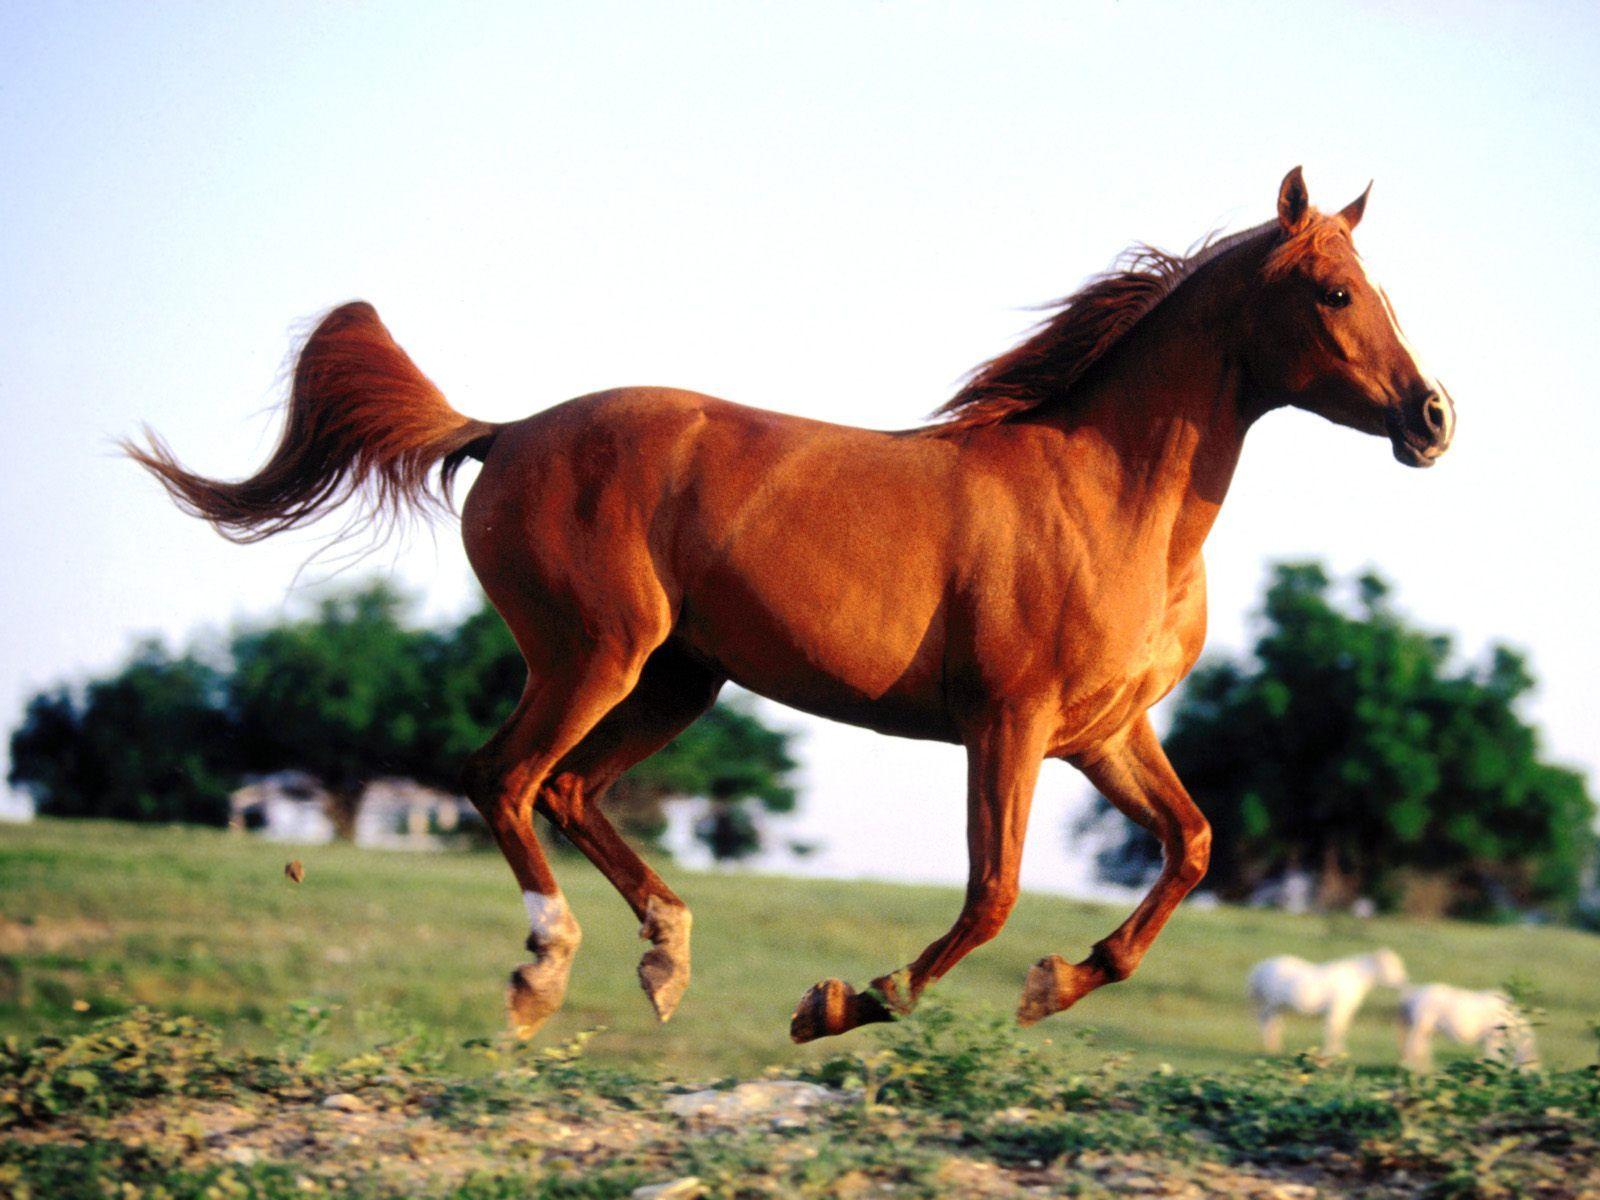 Must see Wallpaper Horse Spirit - 9a7fde928dc8cd7adddb55b8067ee6a1  HD_879888.jpg